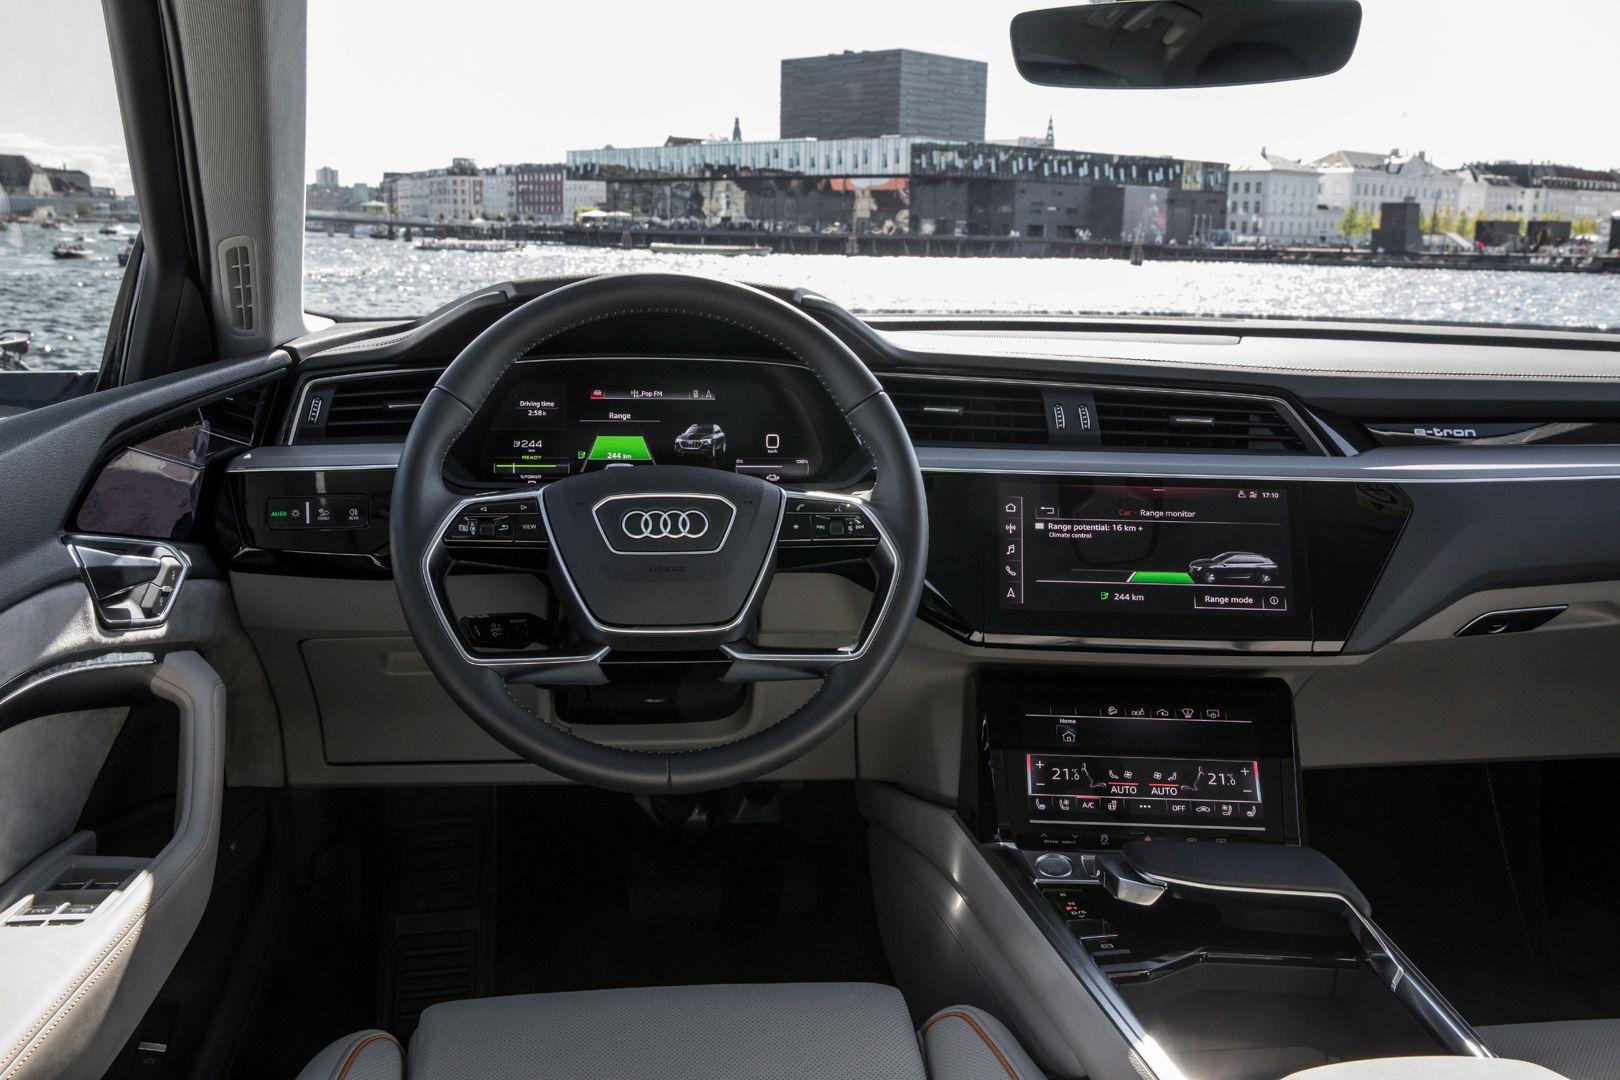 Audi E Tron Interior Revealed Ahead Of Official Reveal Audi E Tron Audi Pickup Trucks